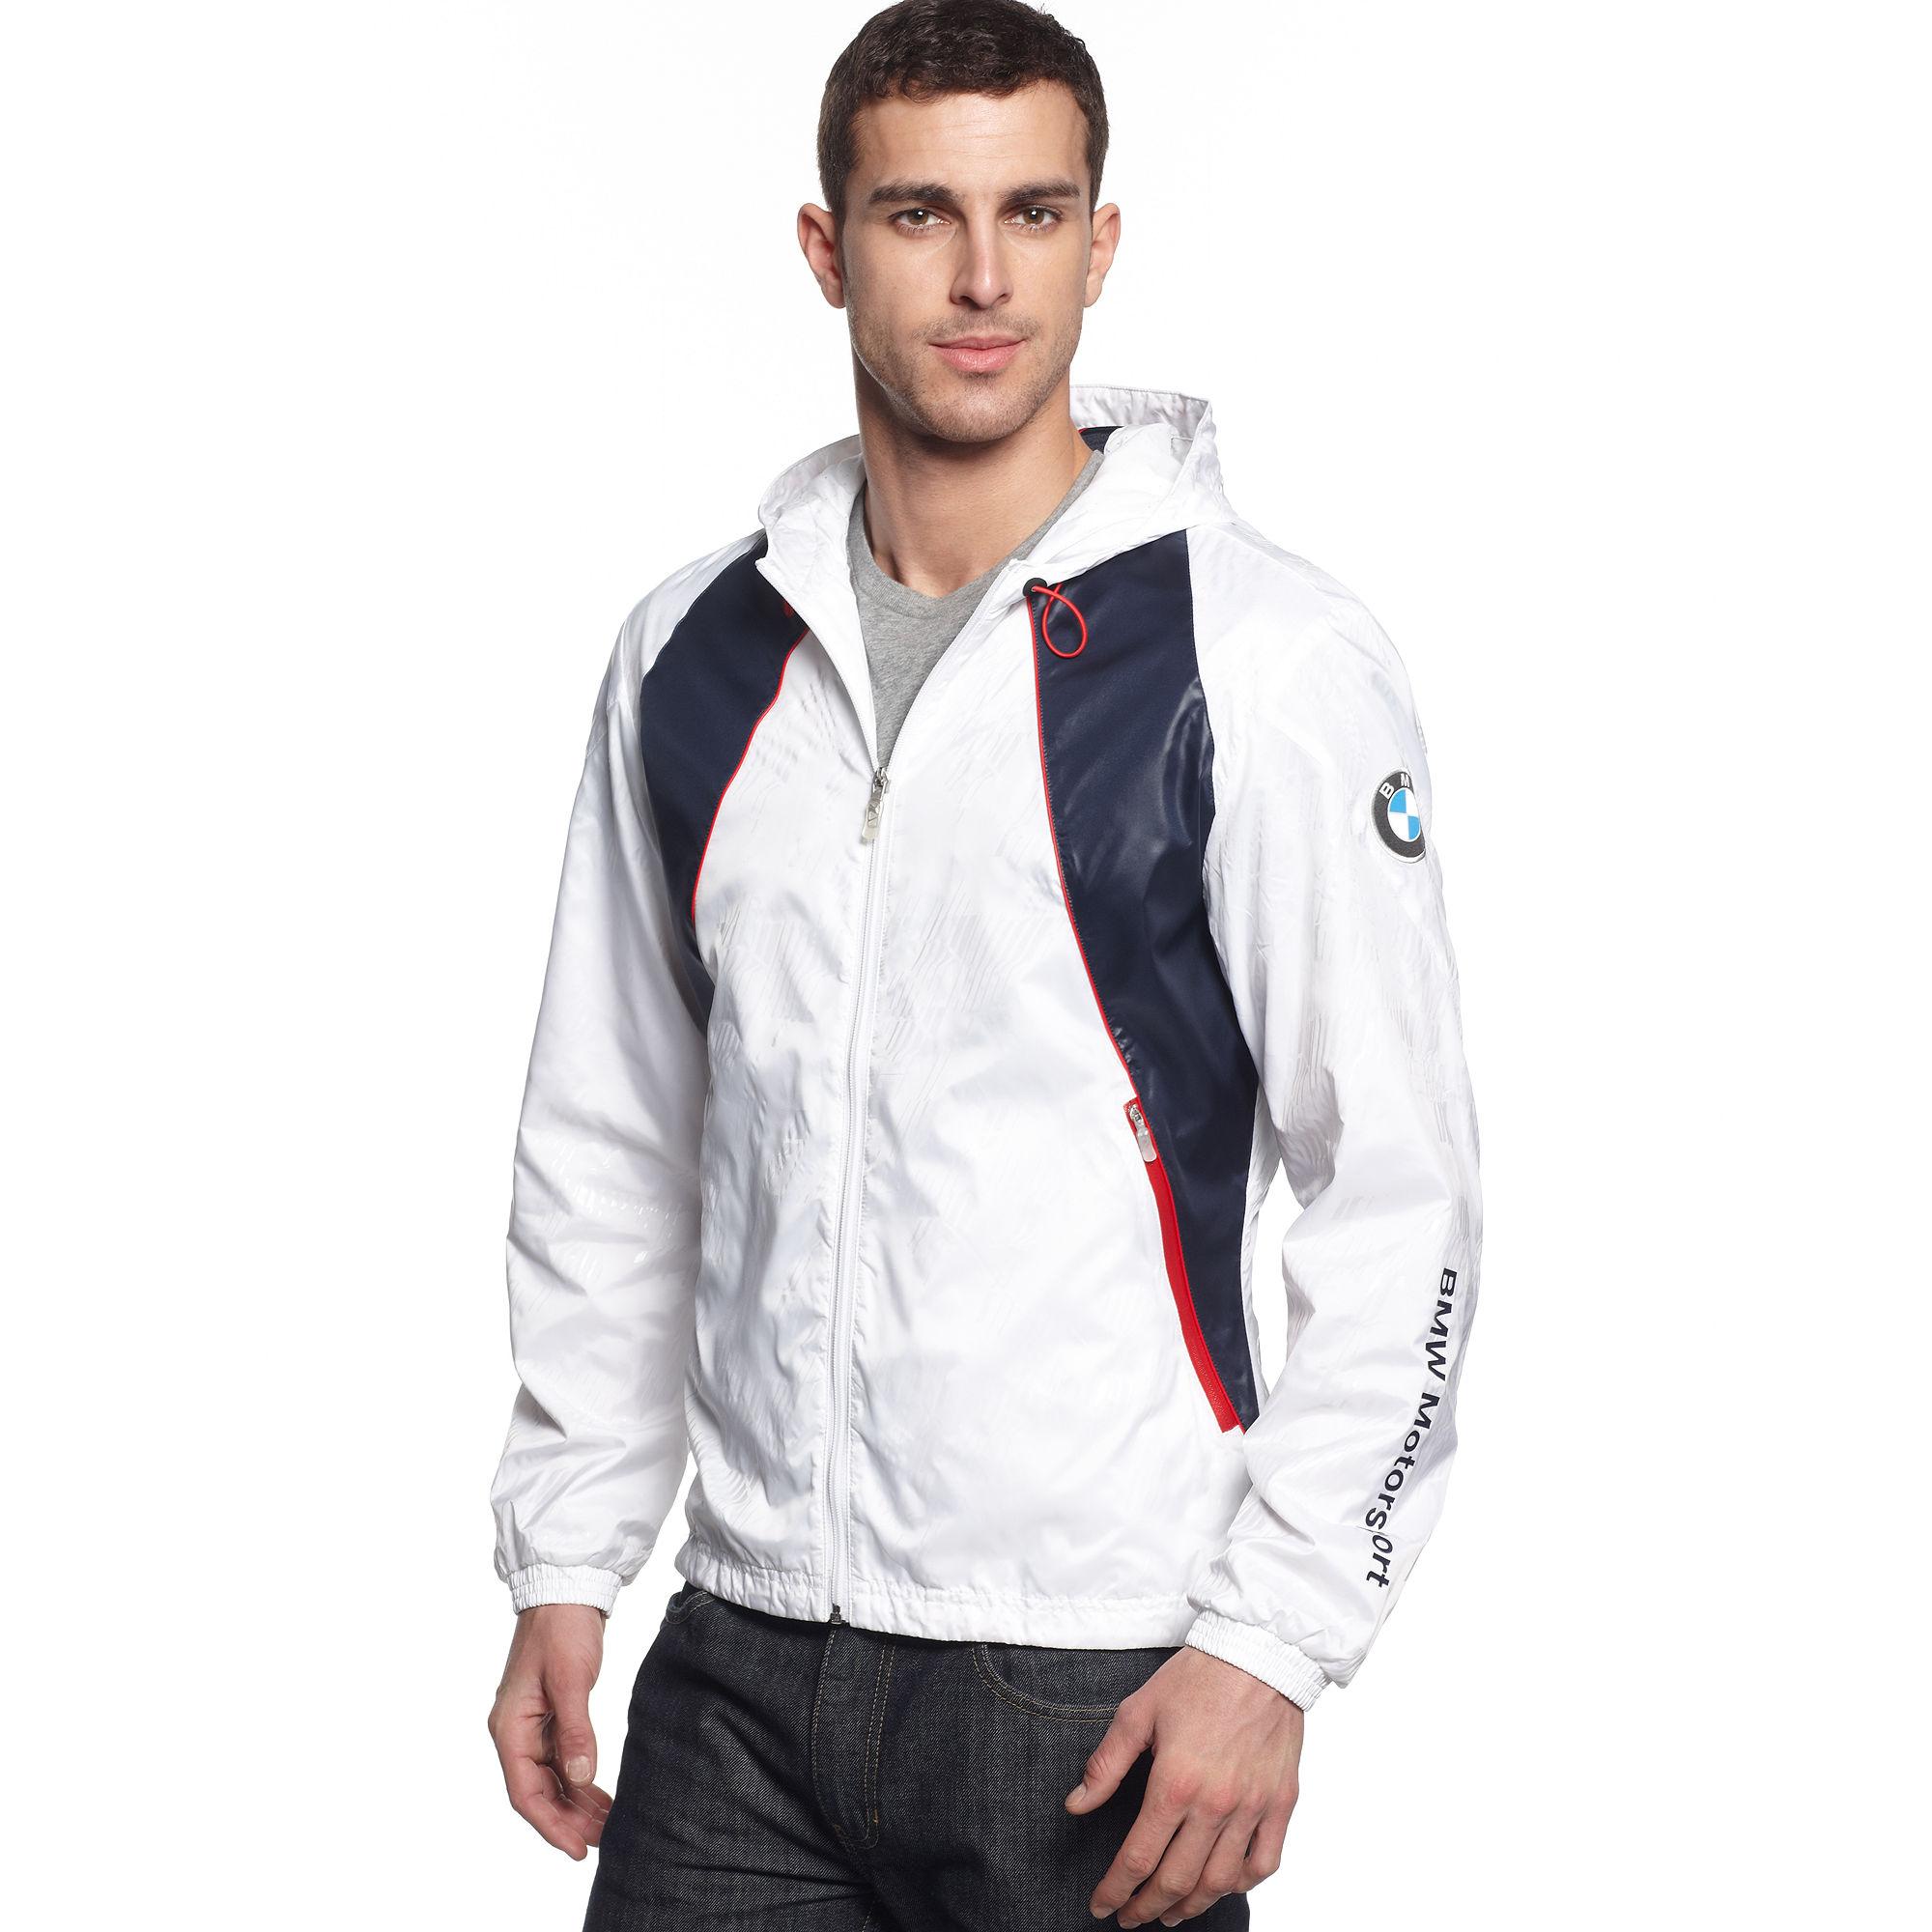 lyst puma bmw lightweight jacket in white for men. Black Bedroom Furniture Sets. Home Design Ideas